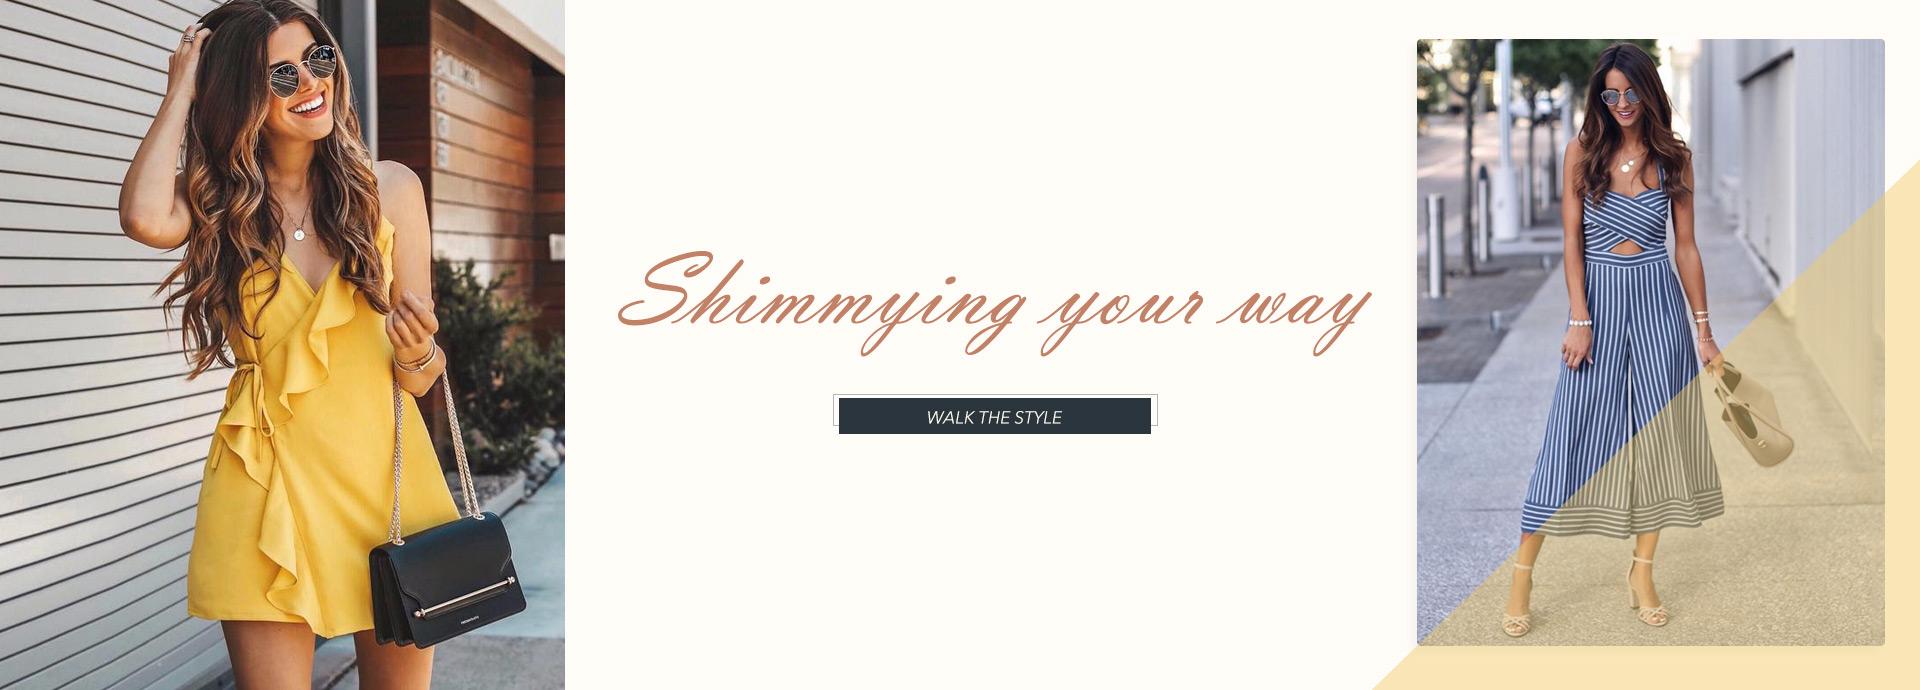 Shimmying your way